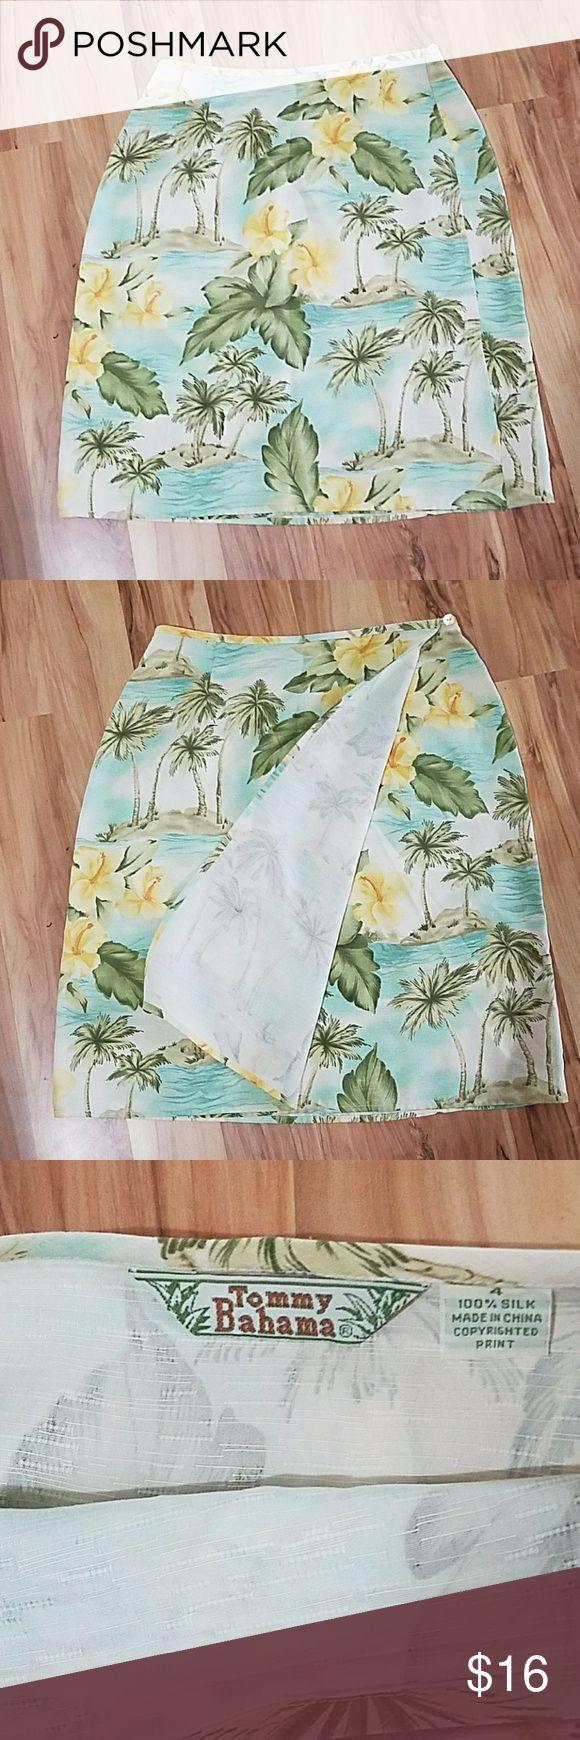 Tommy Bahama Hawaiin print skirt size 4 EUC Tommy Bahama beautiful Hawaiin skirt aqua and yellow and green colors. Wrat around skirt with small buttons to fasten. Falls above knee Tommy Bahama Skirts Midi